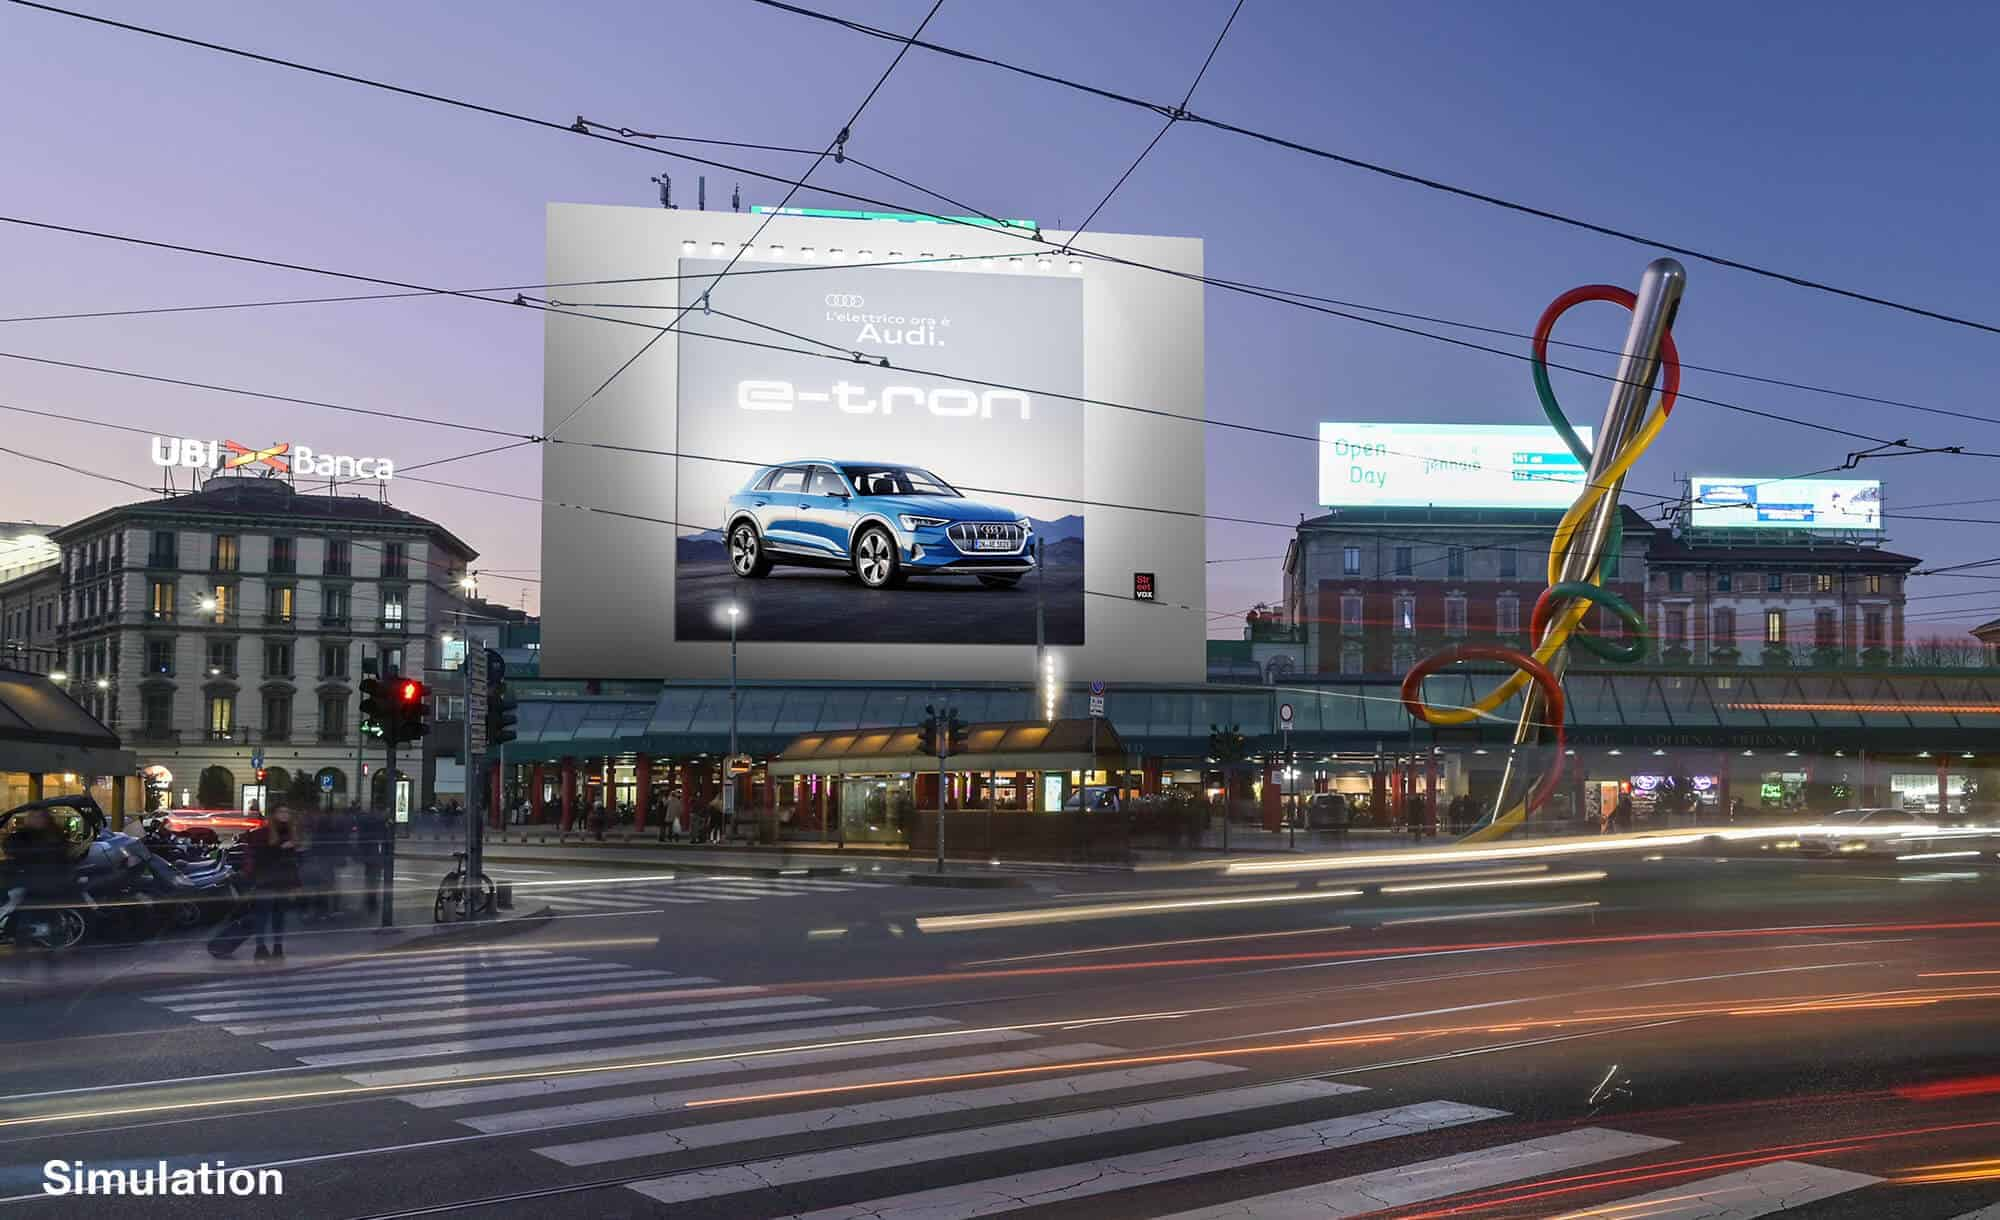 Maxi Affissione a Milano in Piazza Cadorna di Audi (automotive)